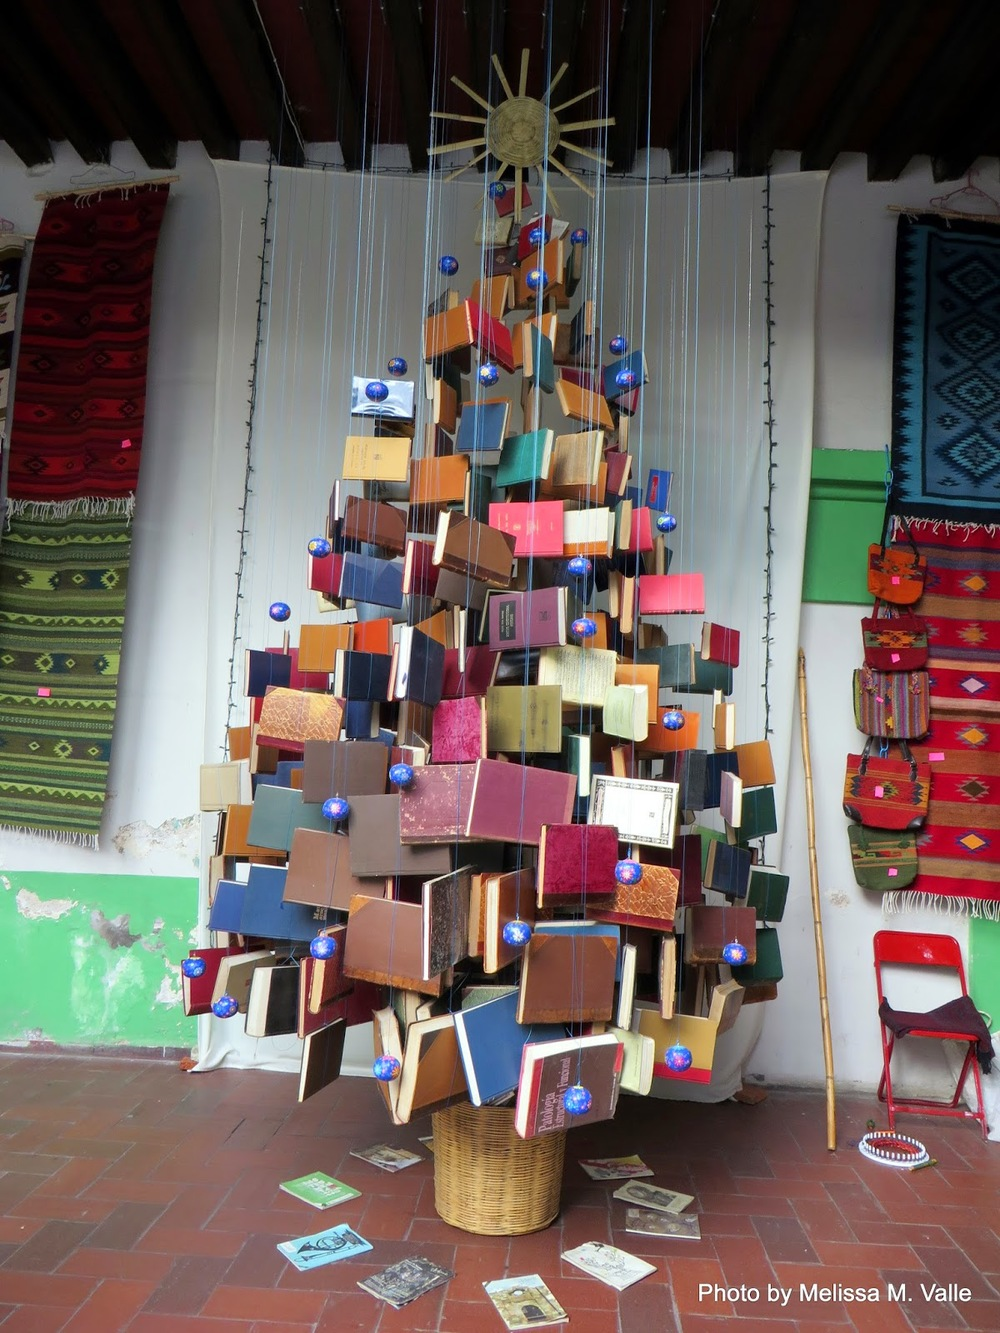 Book tree I peeped inside artisan space near cafe